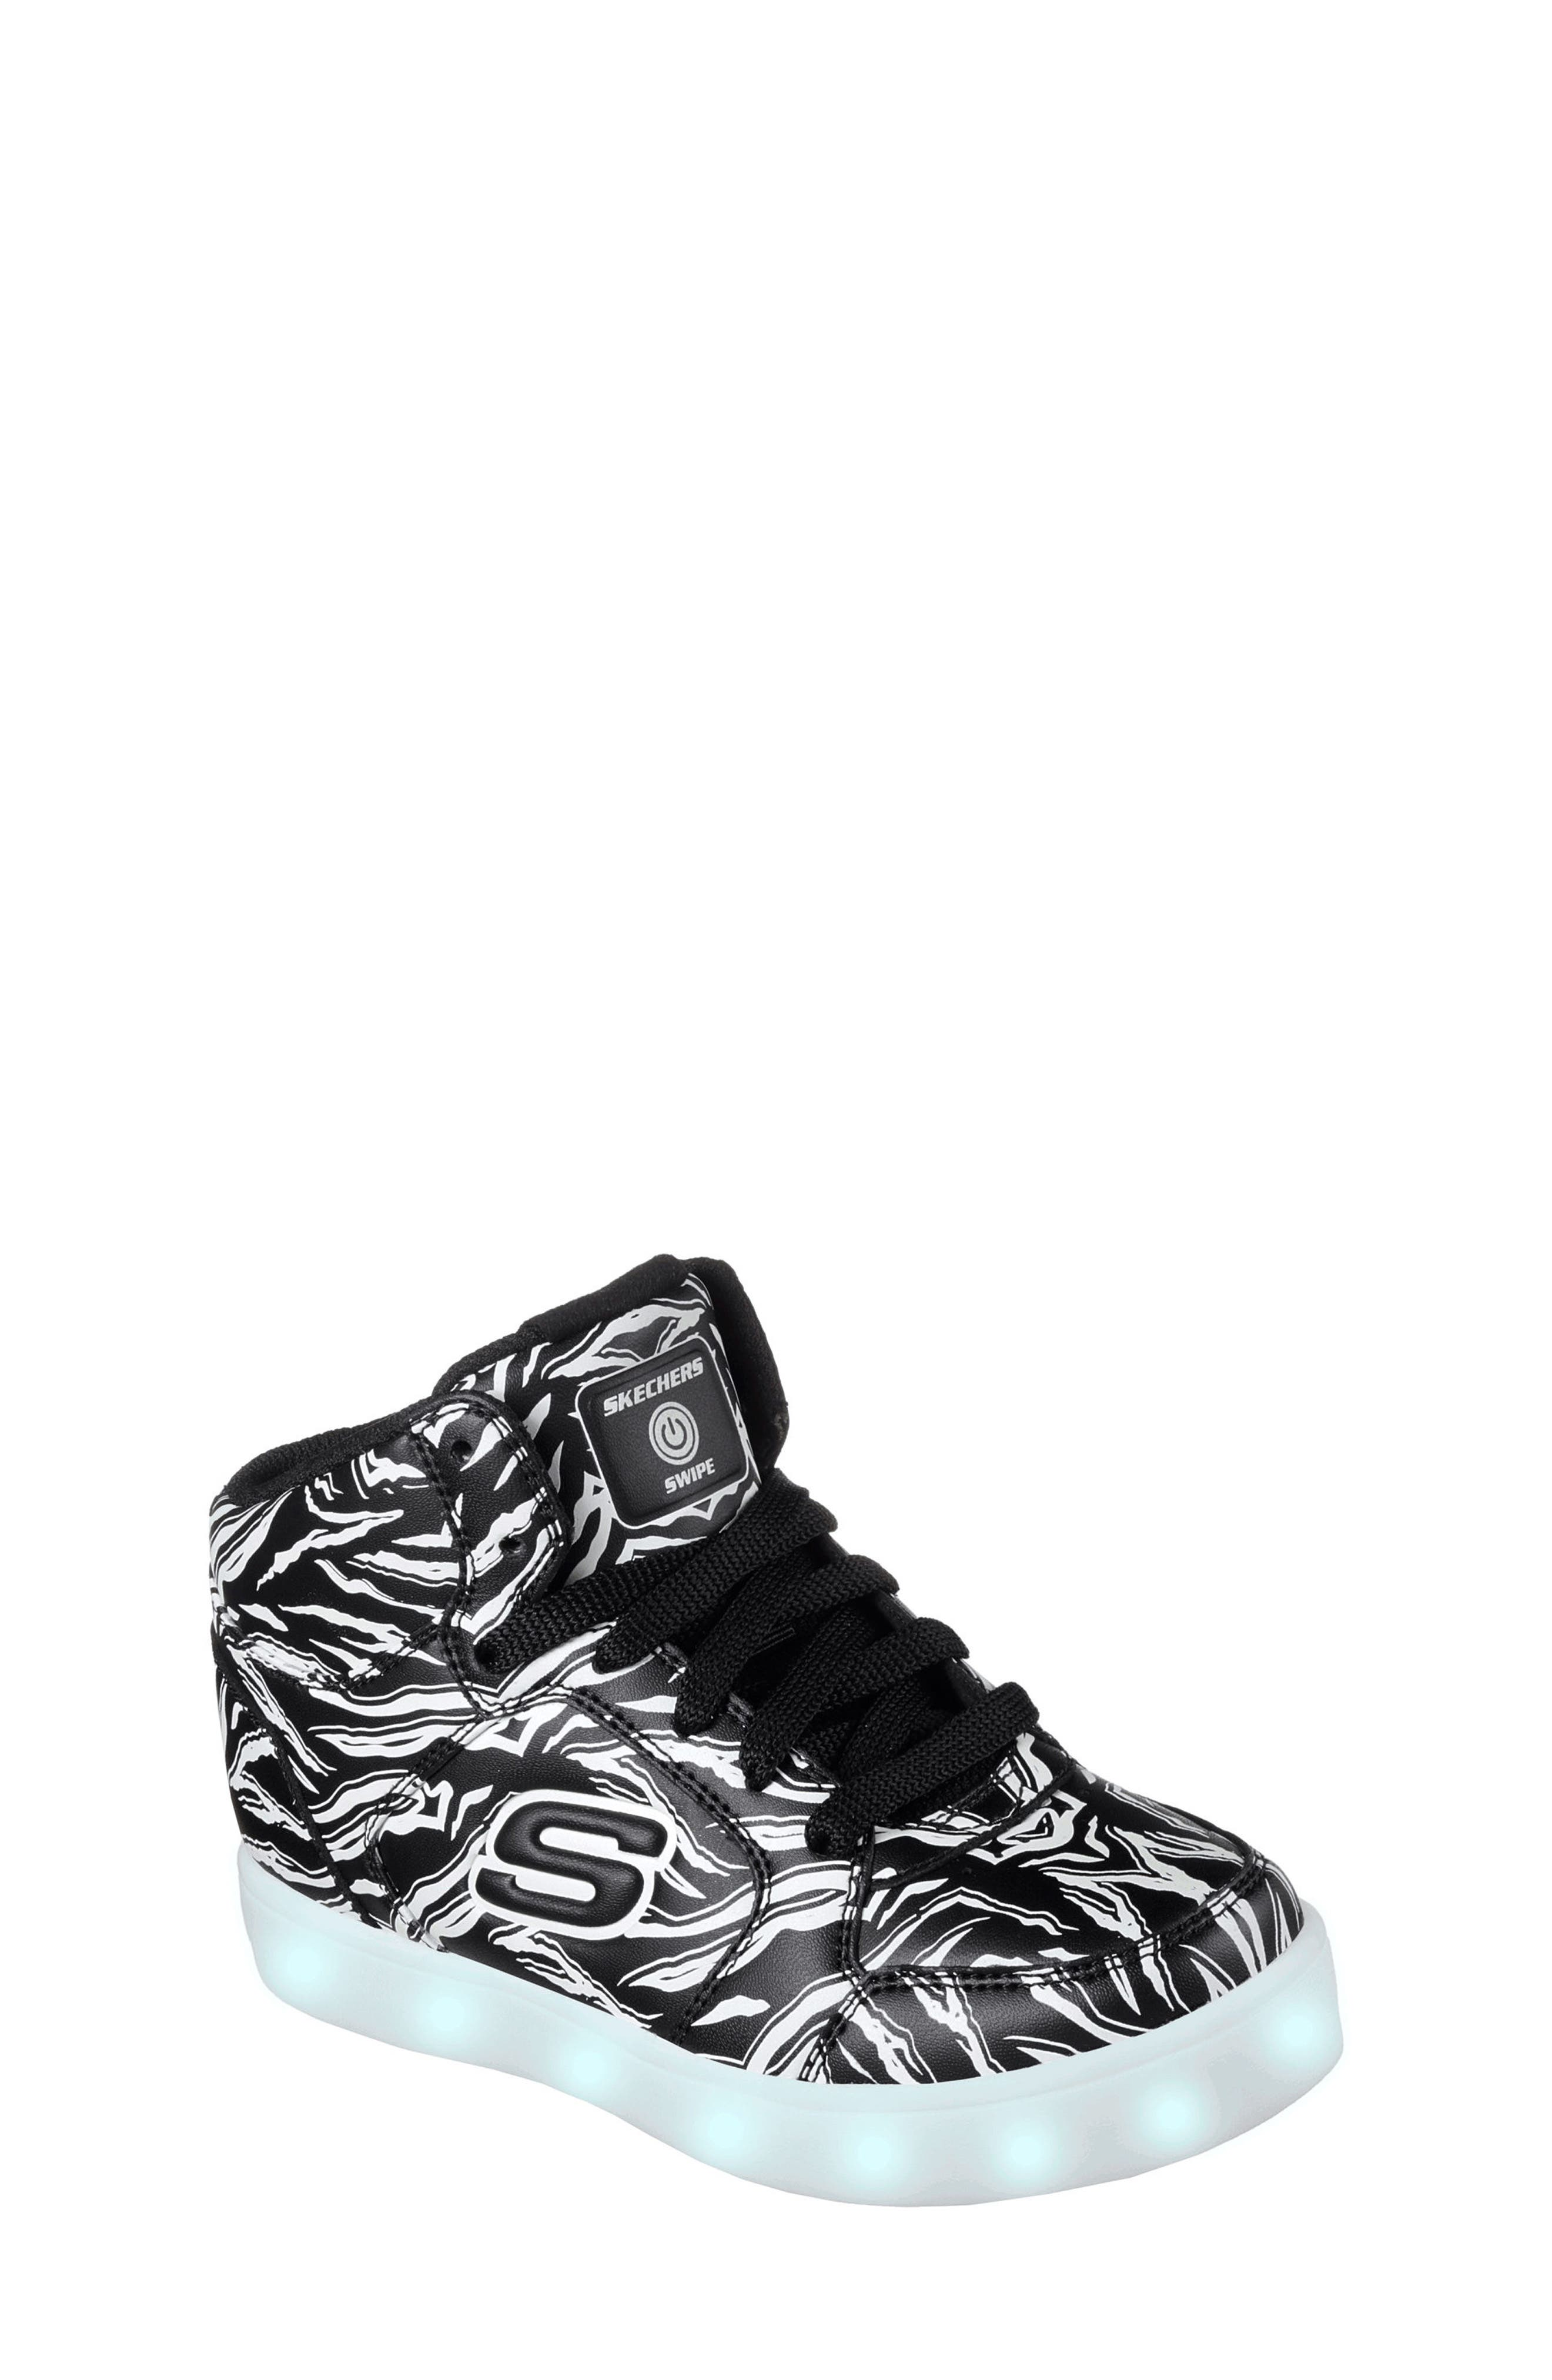 Energy Lights Glow in the Dark Sneaker,                             Alternate thumbnail 8, color,                             017